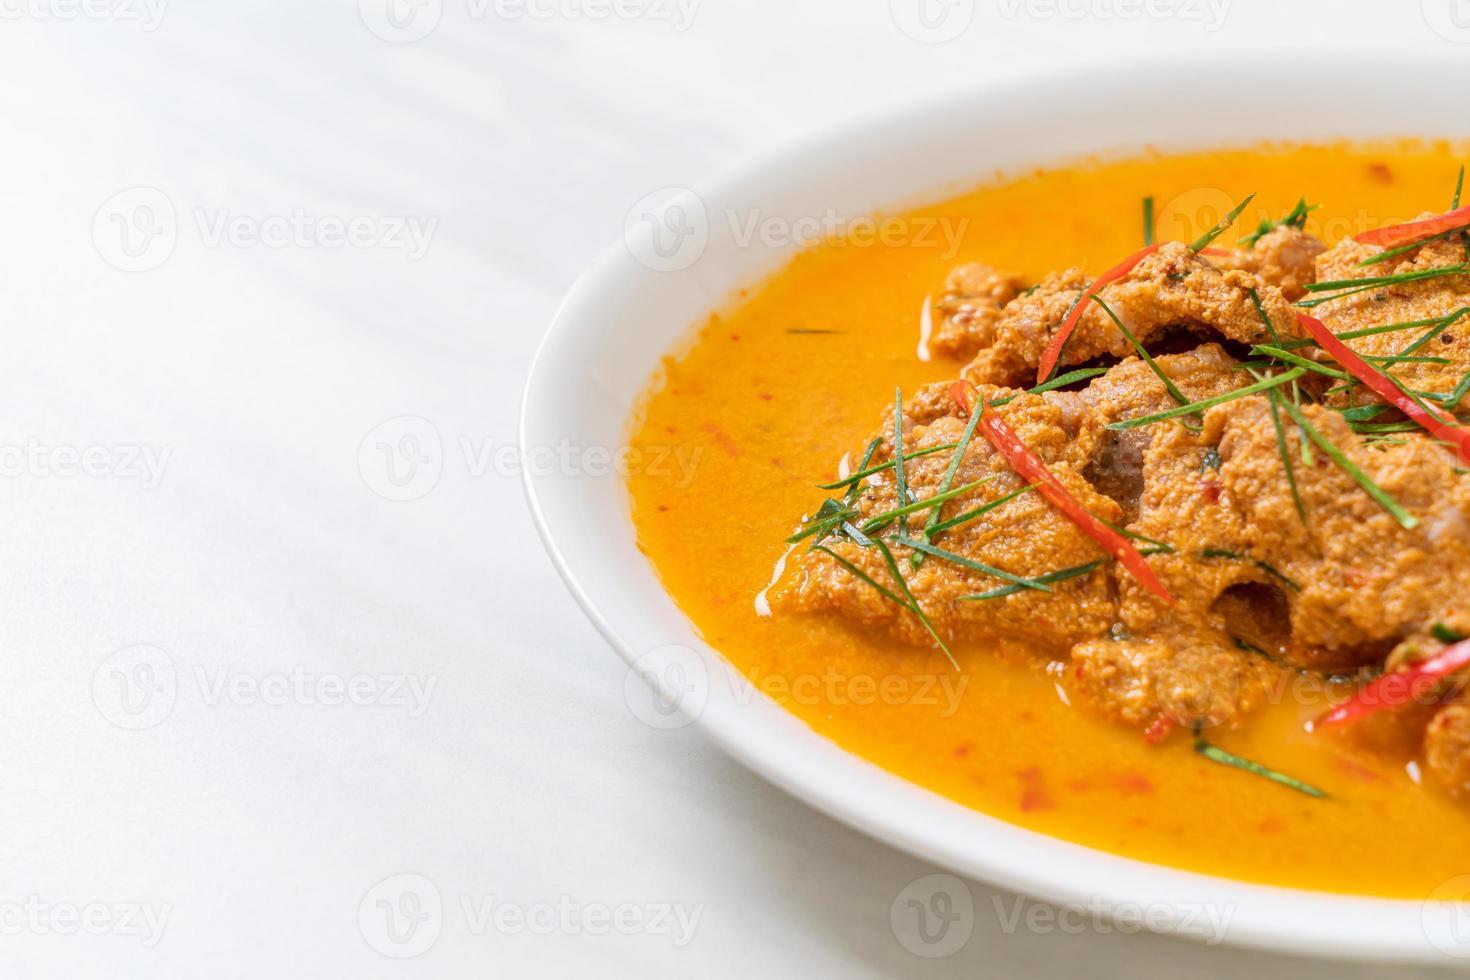 kit pasto tailandese panang curry con maiale - stile cibo tailandese foto